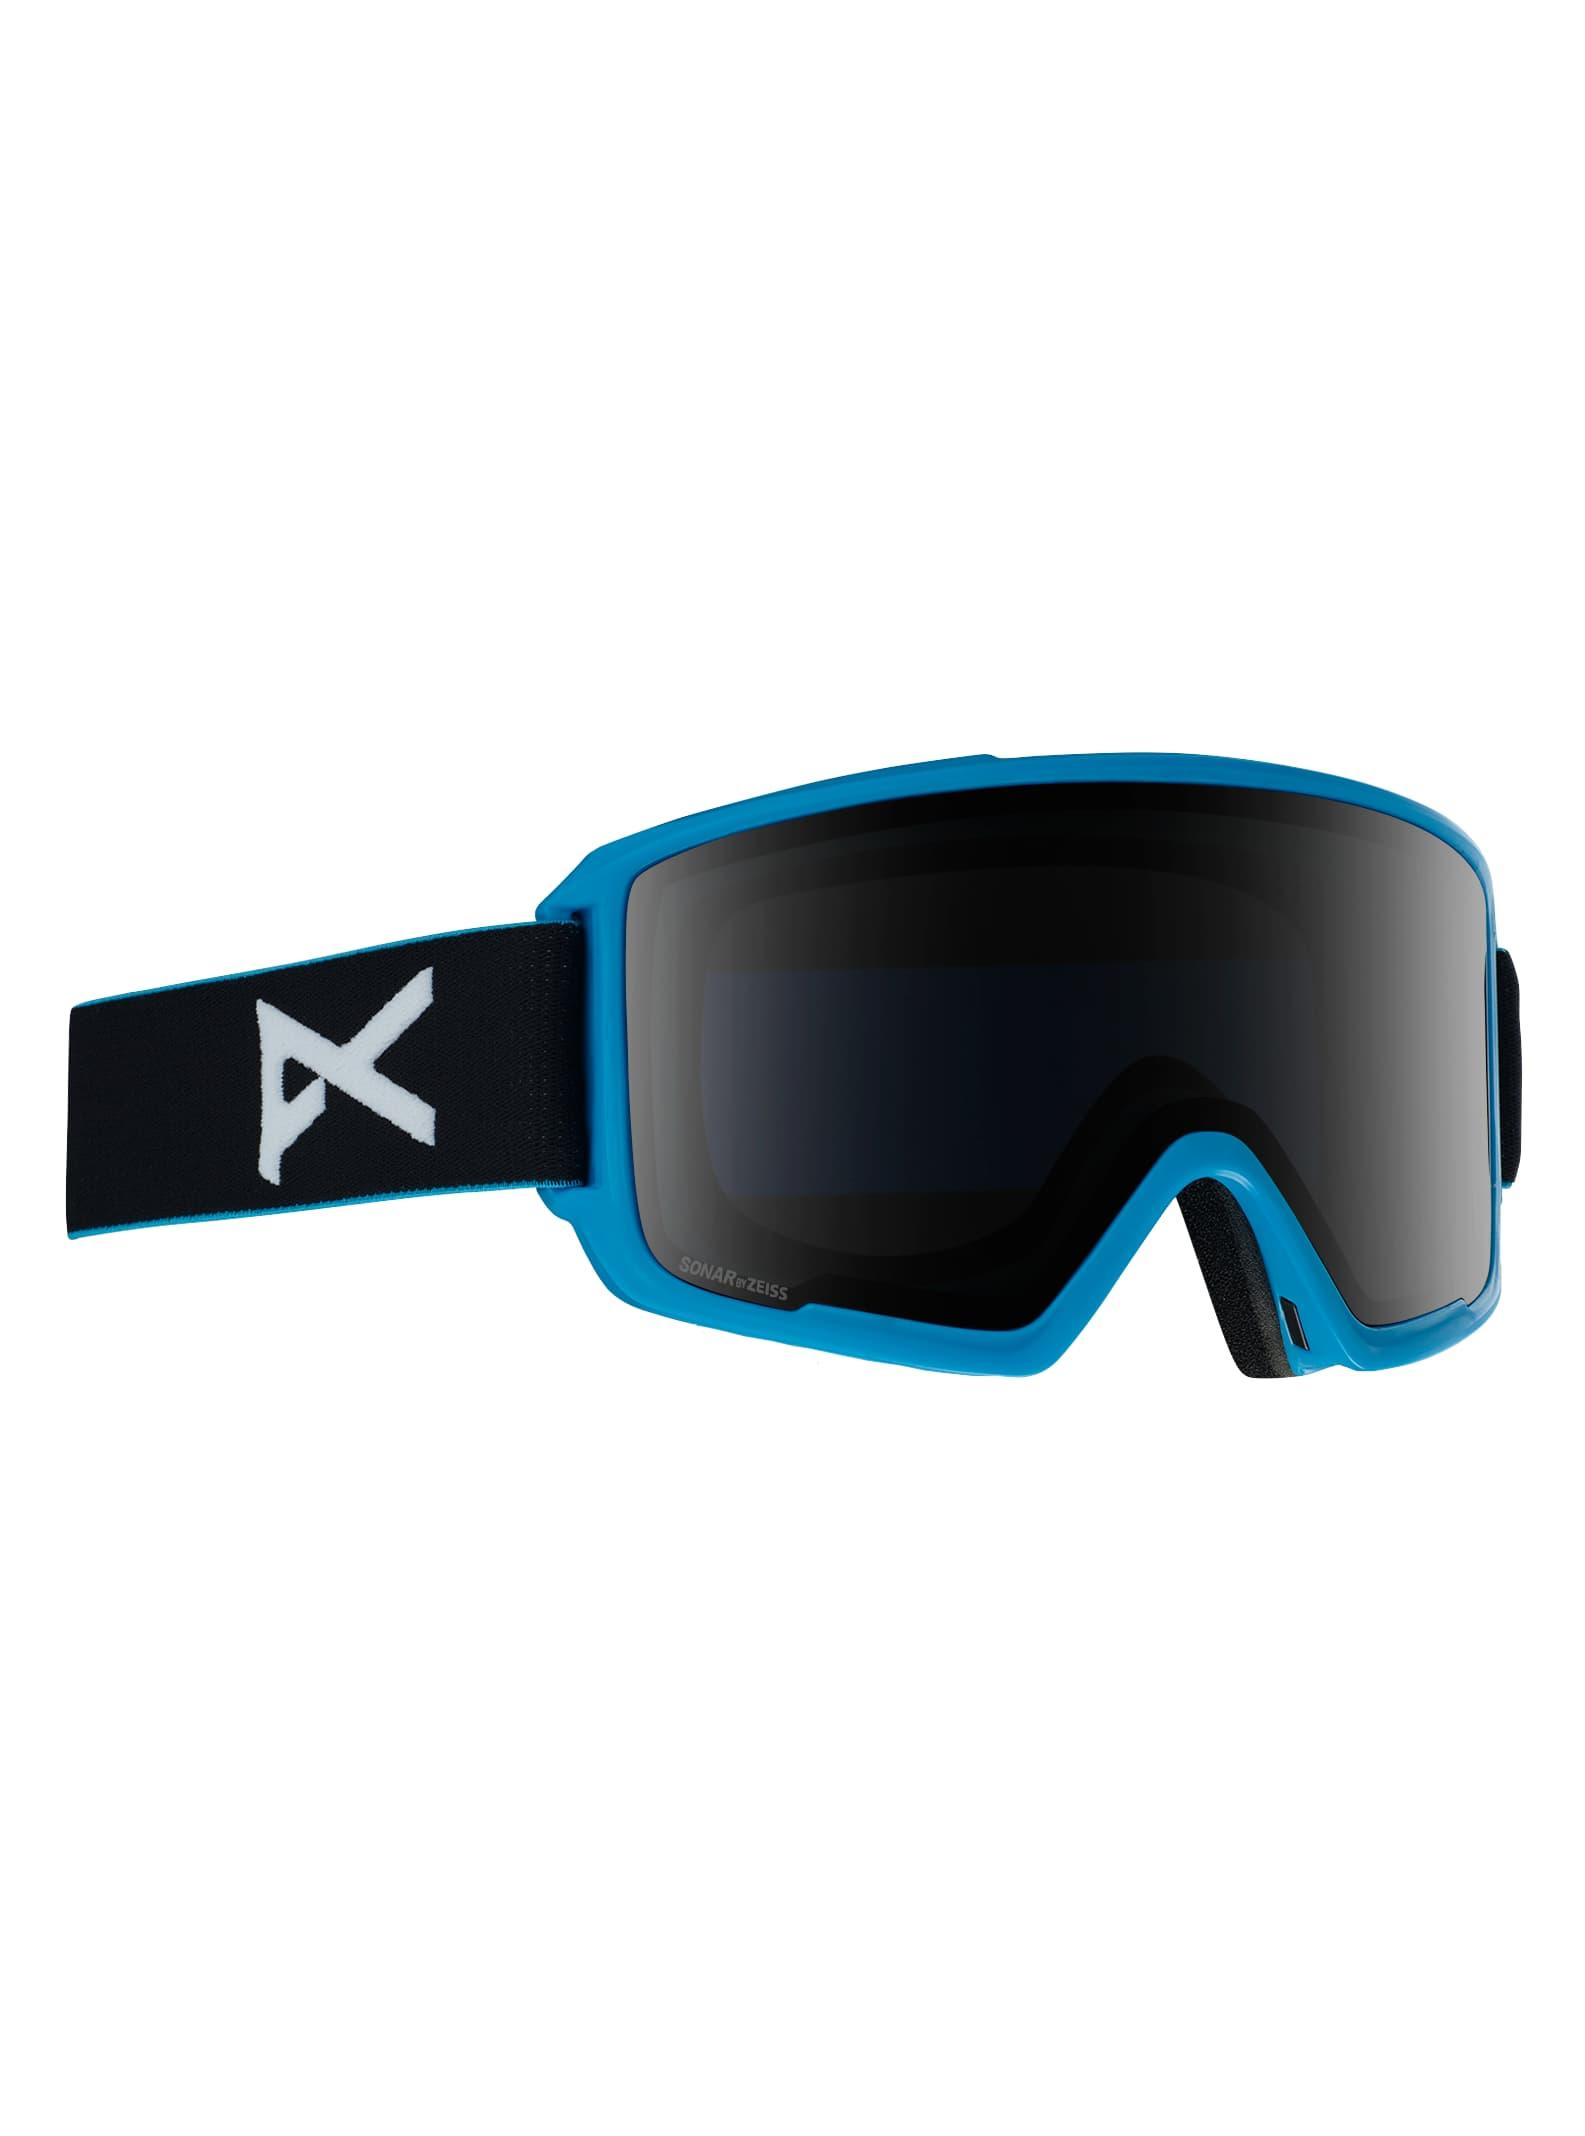 Anon Men's M3 Goggle + Spare Lens, Frame: Blue, Lens: SONAR Smoke, Spare Lens: SONAR Blue